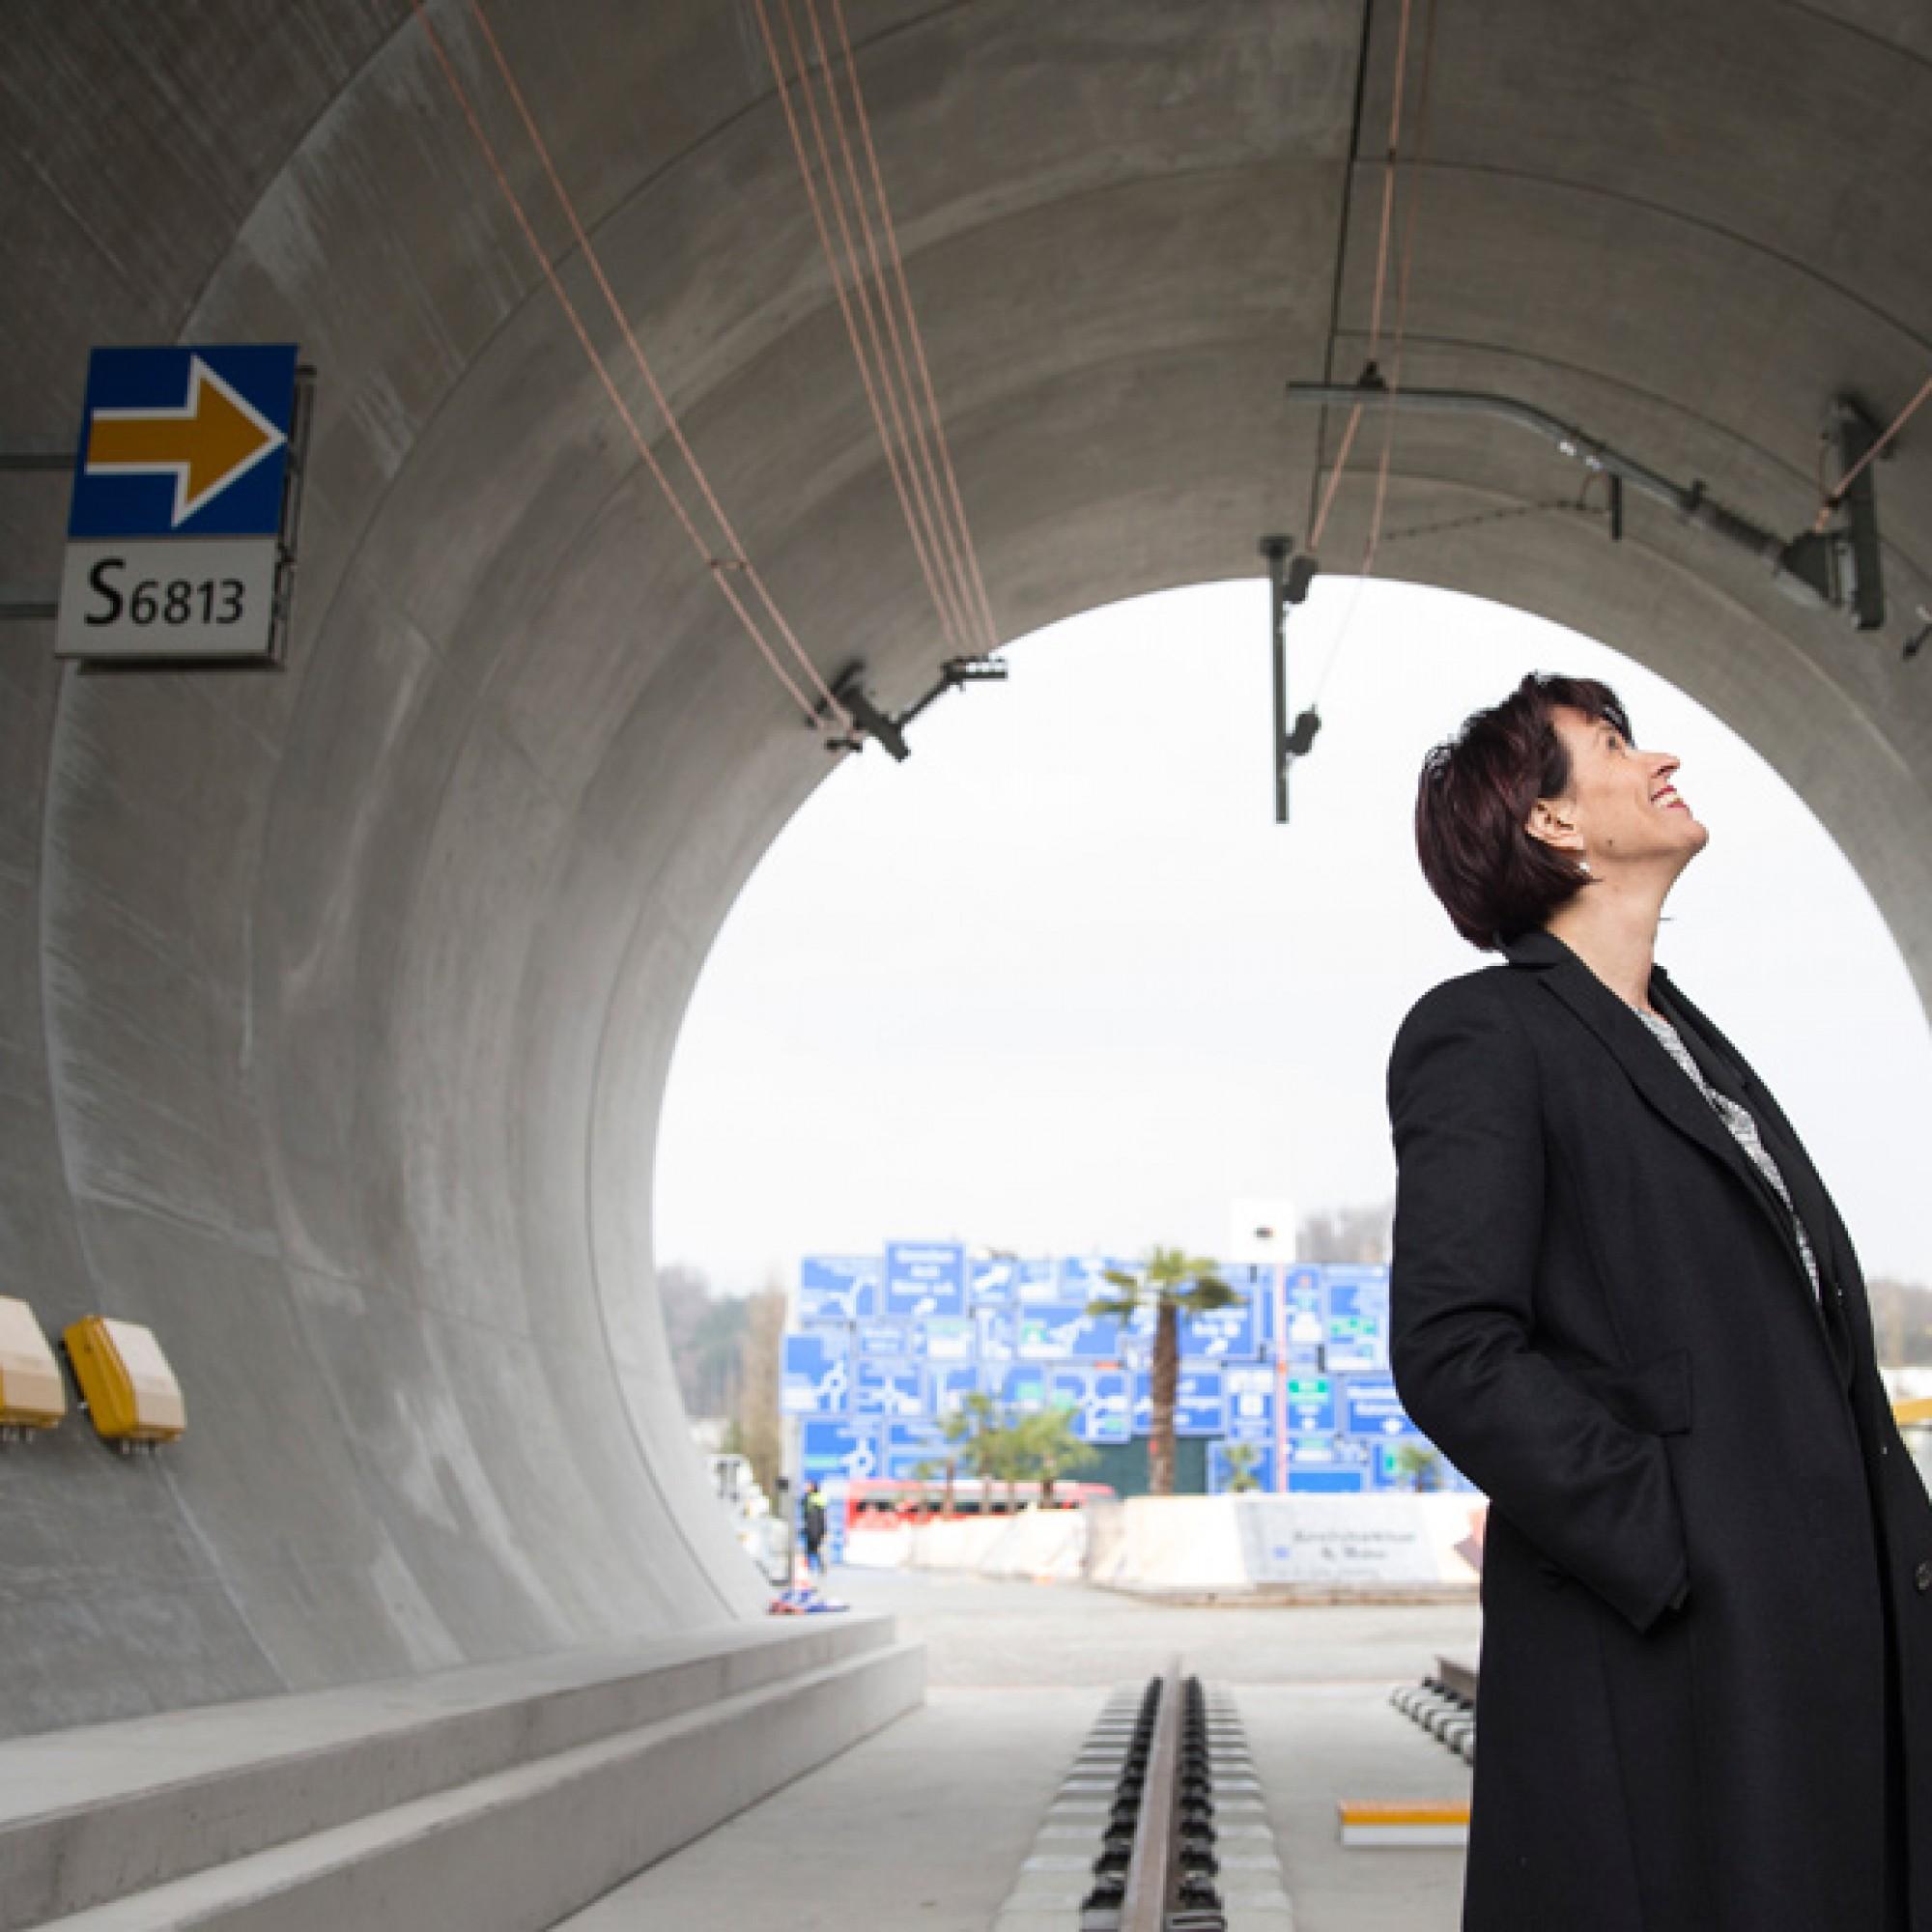 Doris Leuthard begutachtet den wohl  kürzesten Bahntunnel der Welt an der Eröffnung der Ausstellung. (PHOTOPRESS/Dominik Baur/ zvg Verkehrshaus)